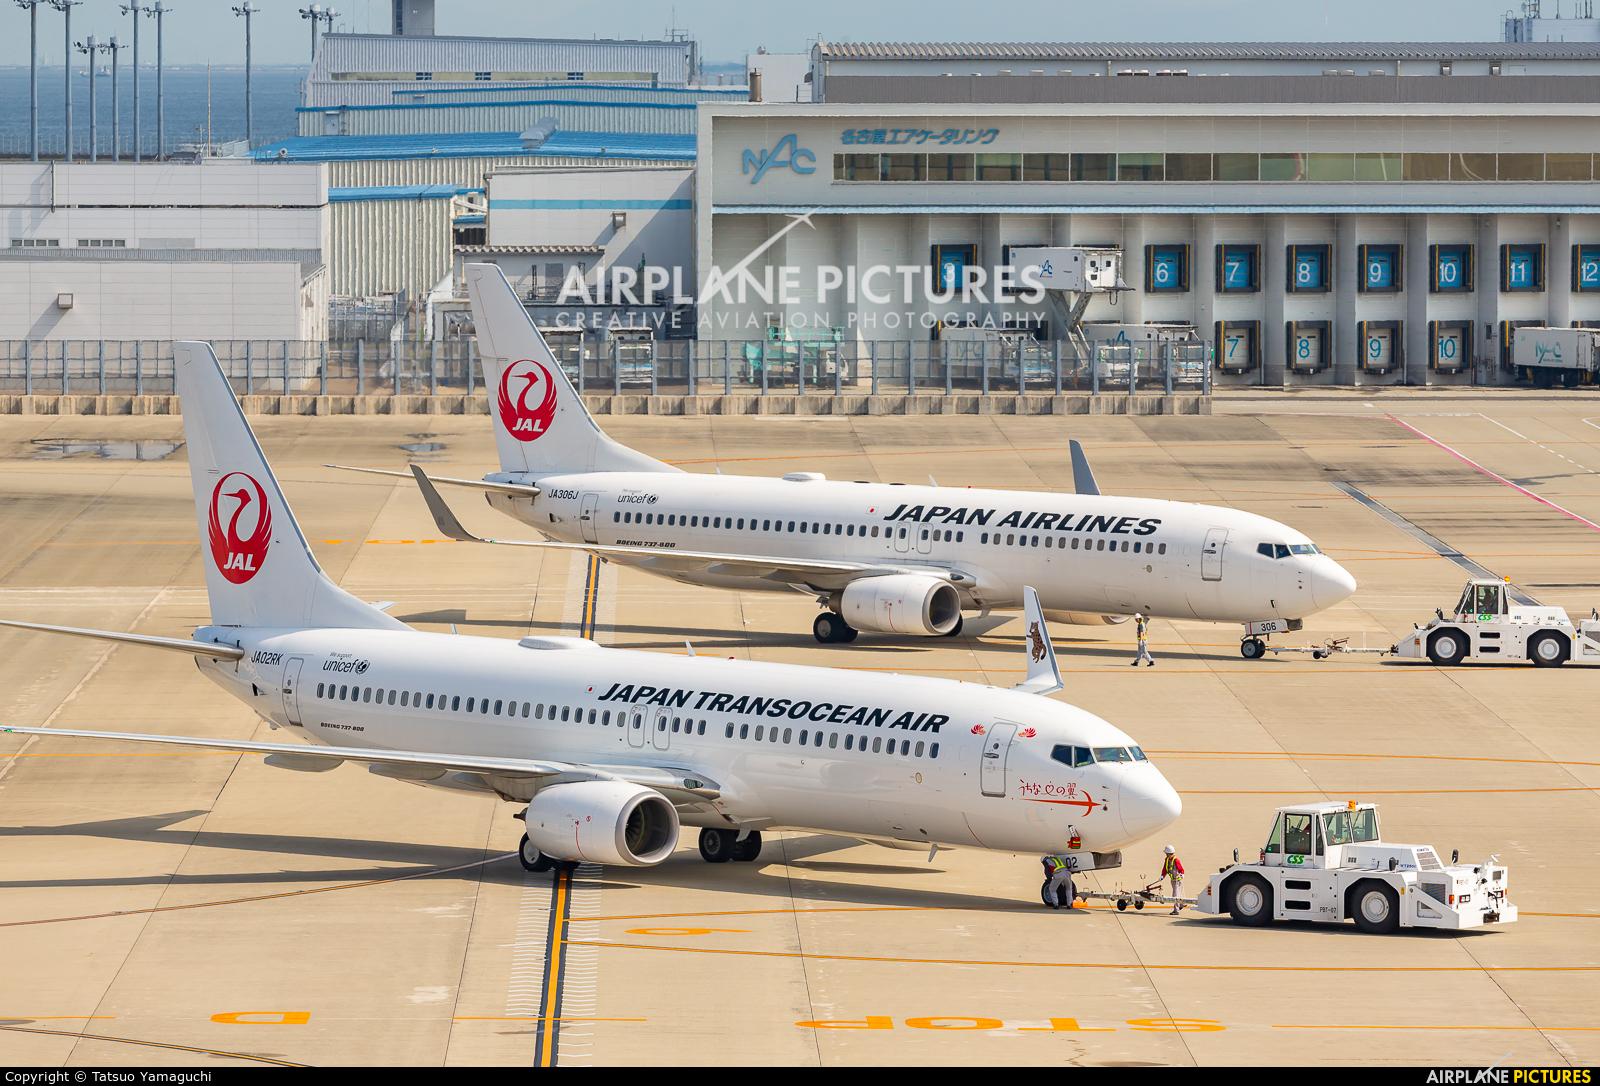 JAL - Japan Transocean Air JA02RK aircraft at Chubu Centrair Intl